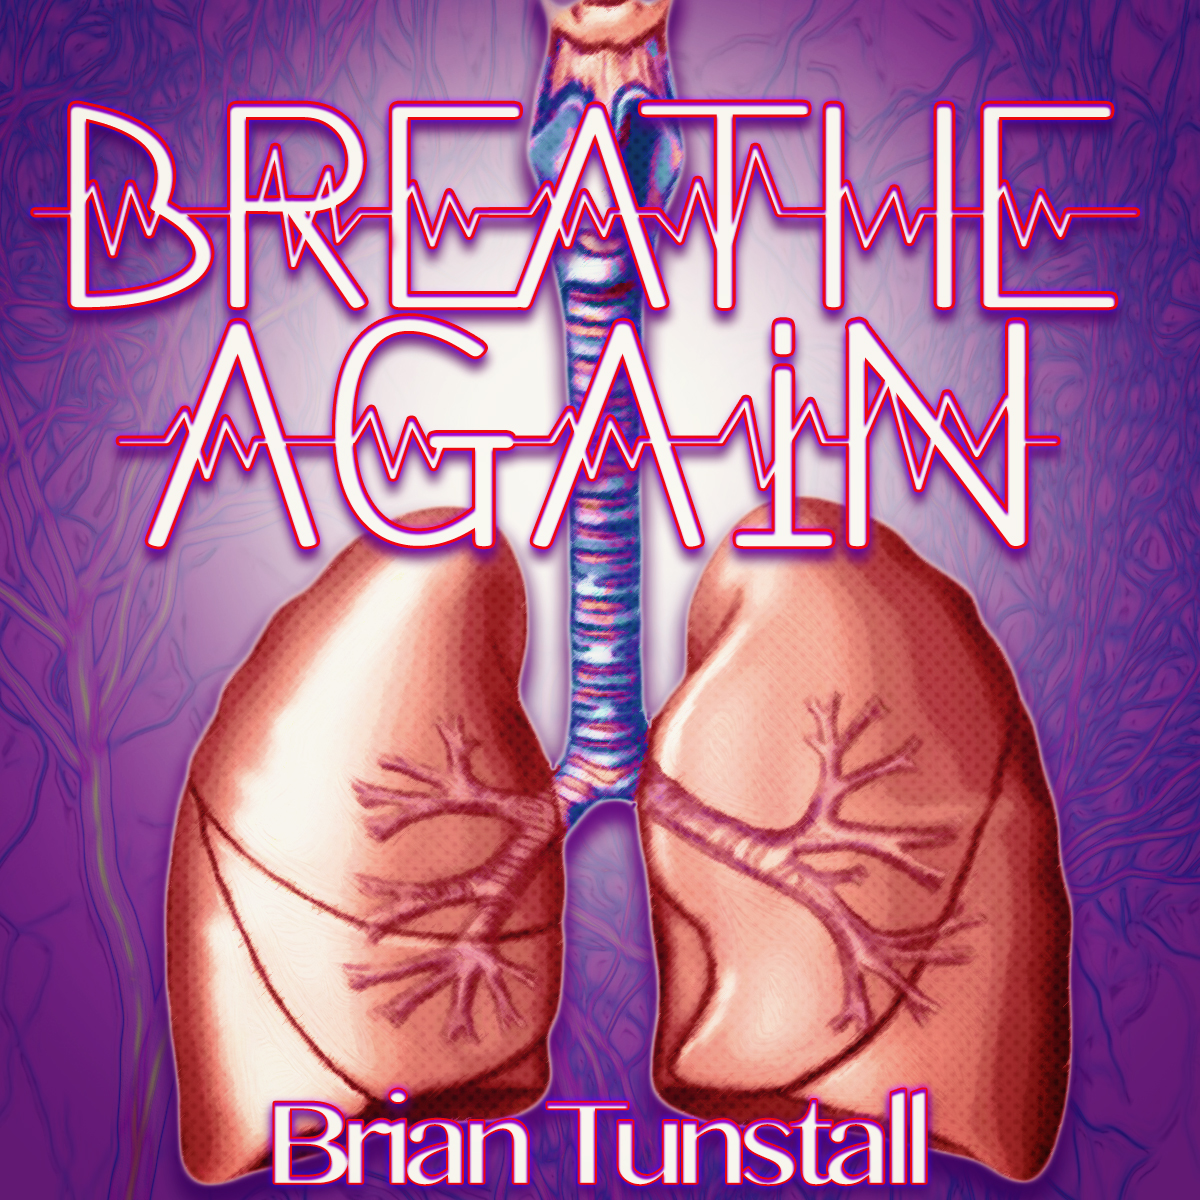 Breath Again by Brian Tunstall